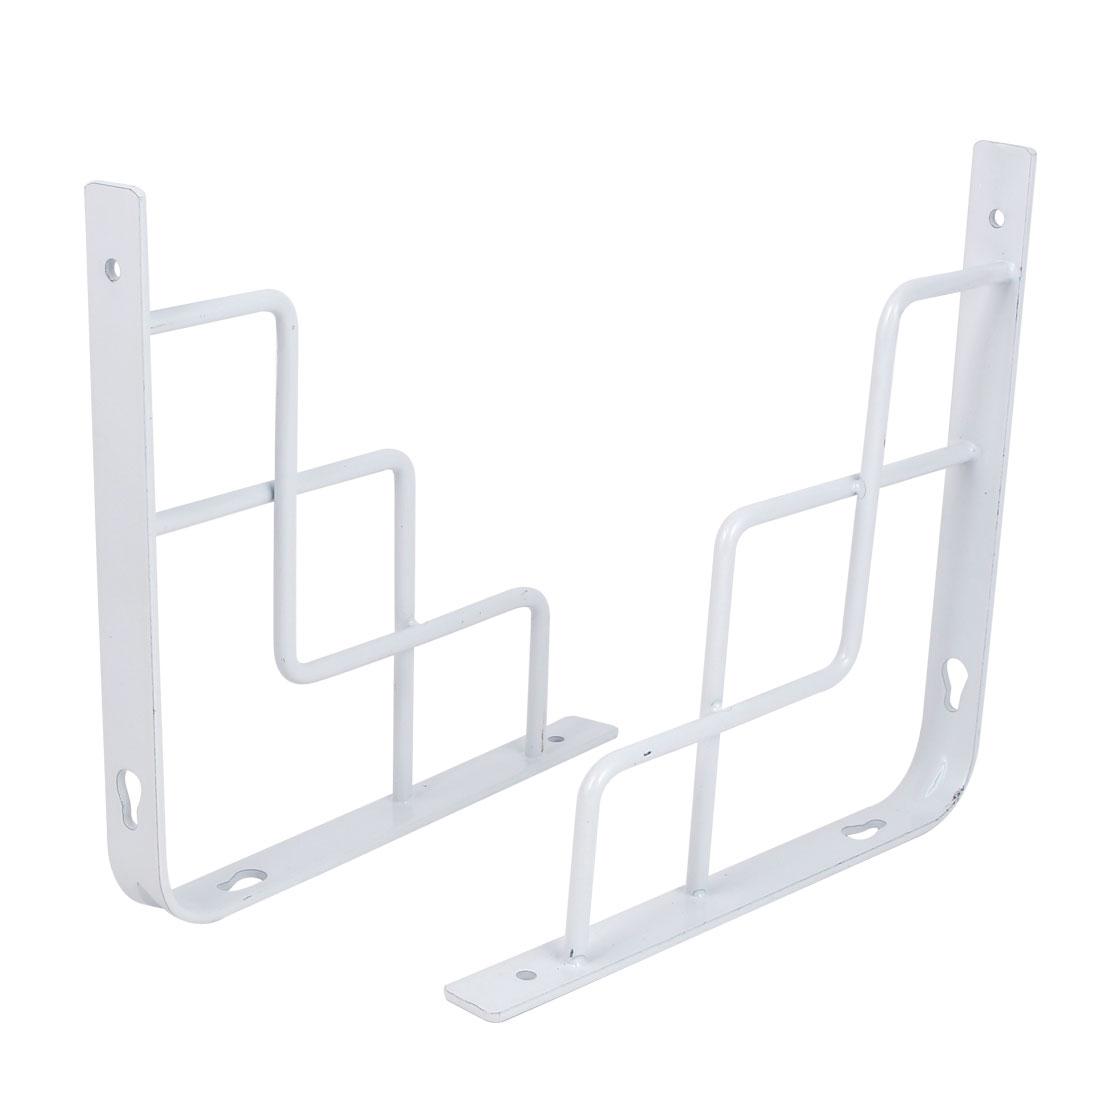 Home Store Wall Mounted Metal L Shaped Shelf Bracket White 200x200mm 2pcs